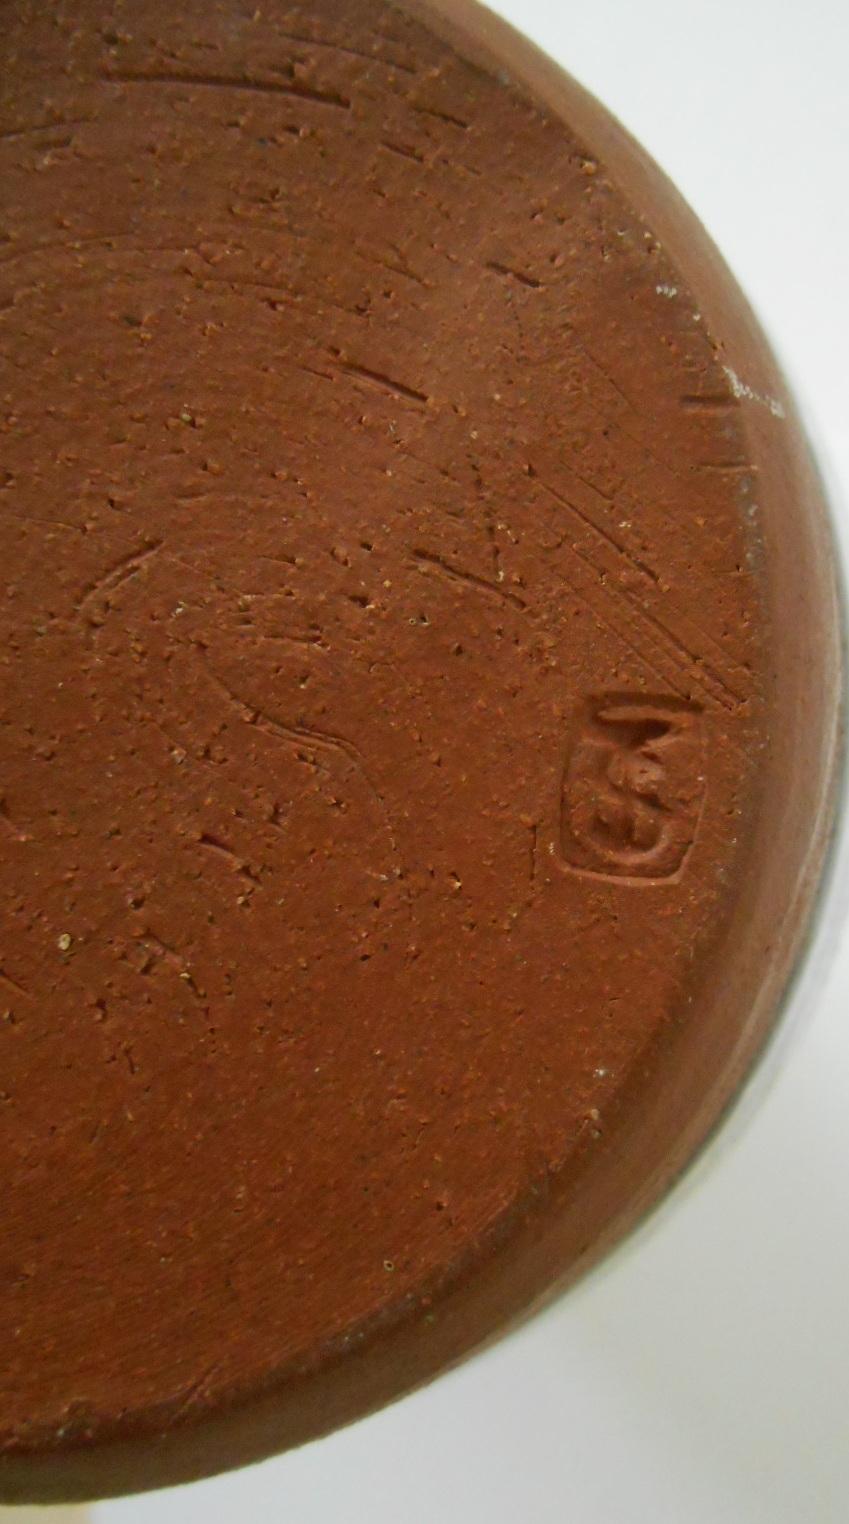 Earthenware Vase J S or T S initials - John Shelly? I.D. help appreciated. Dscn2014